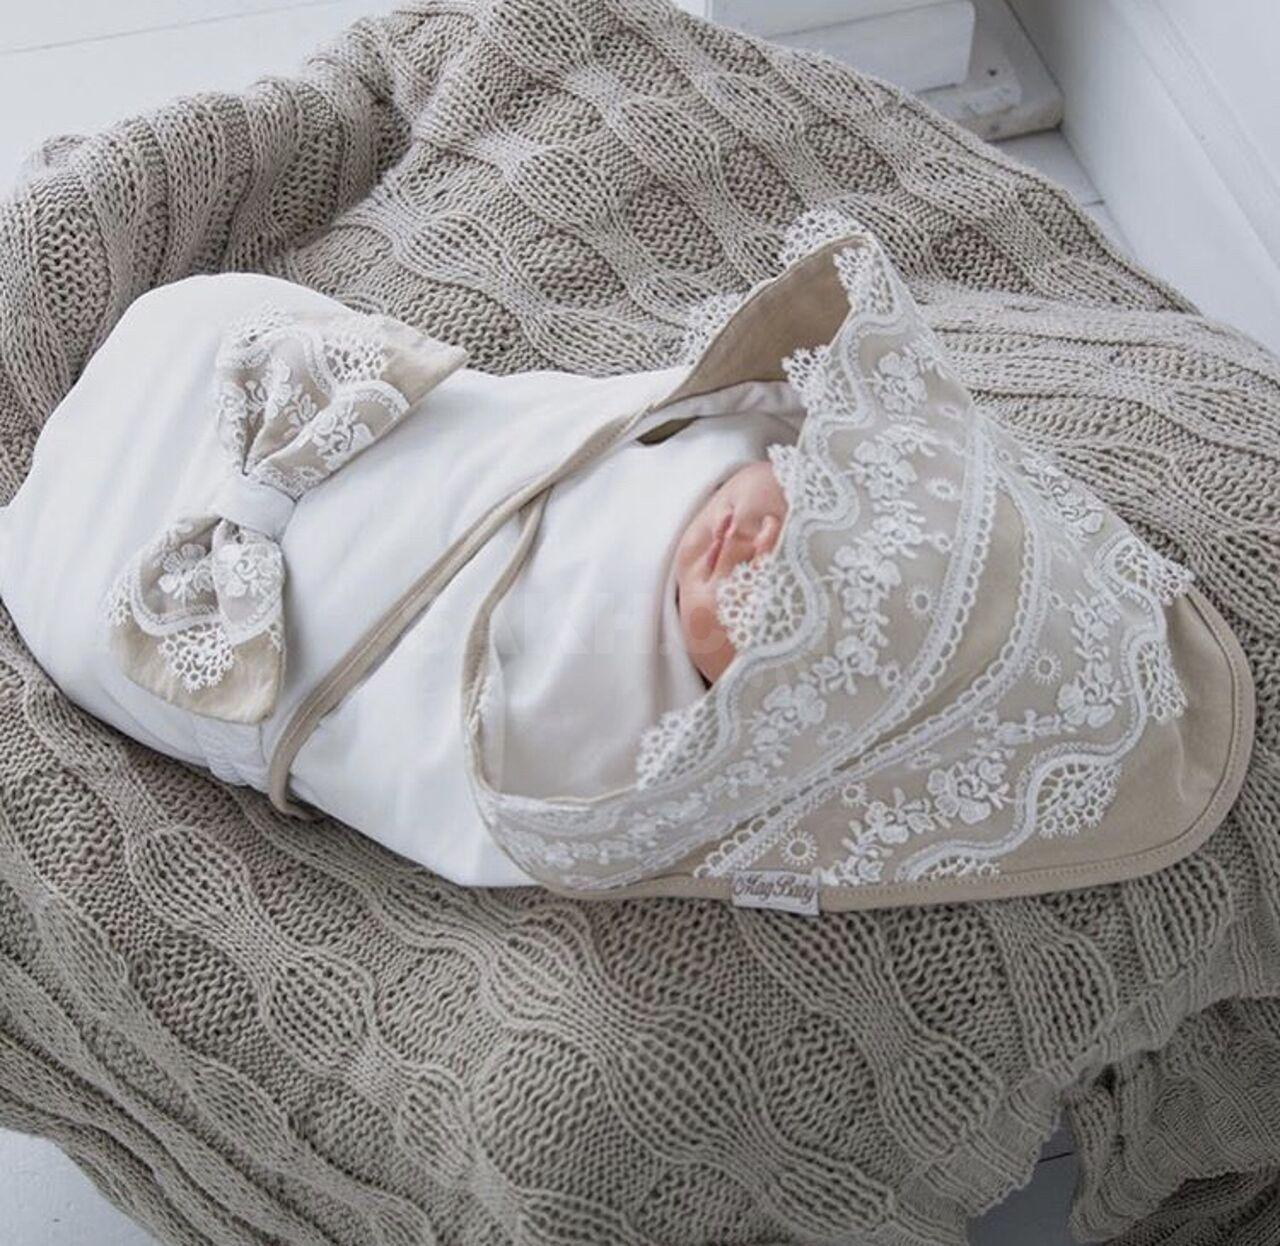 упругого плед на выписку летом фото одеяло